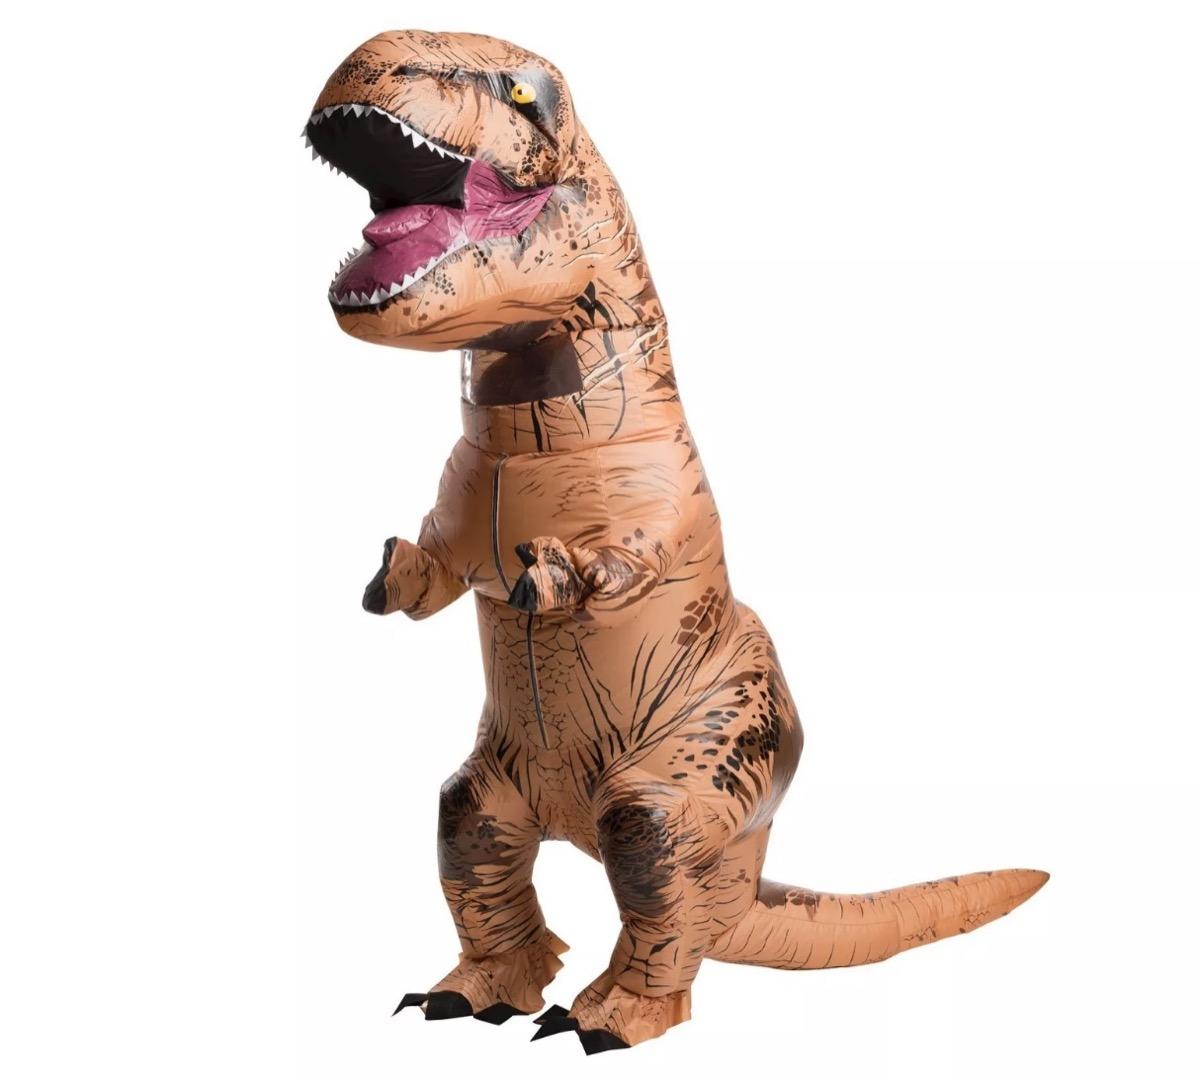 inflatable t-rex costume, best halloween costumes